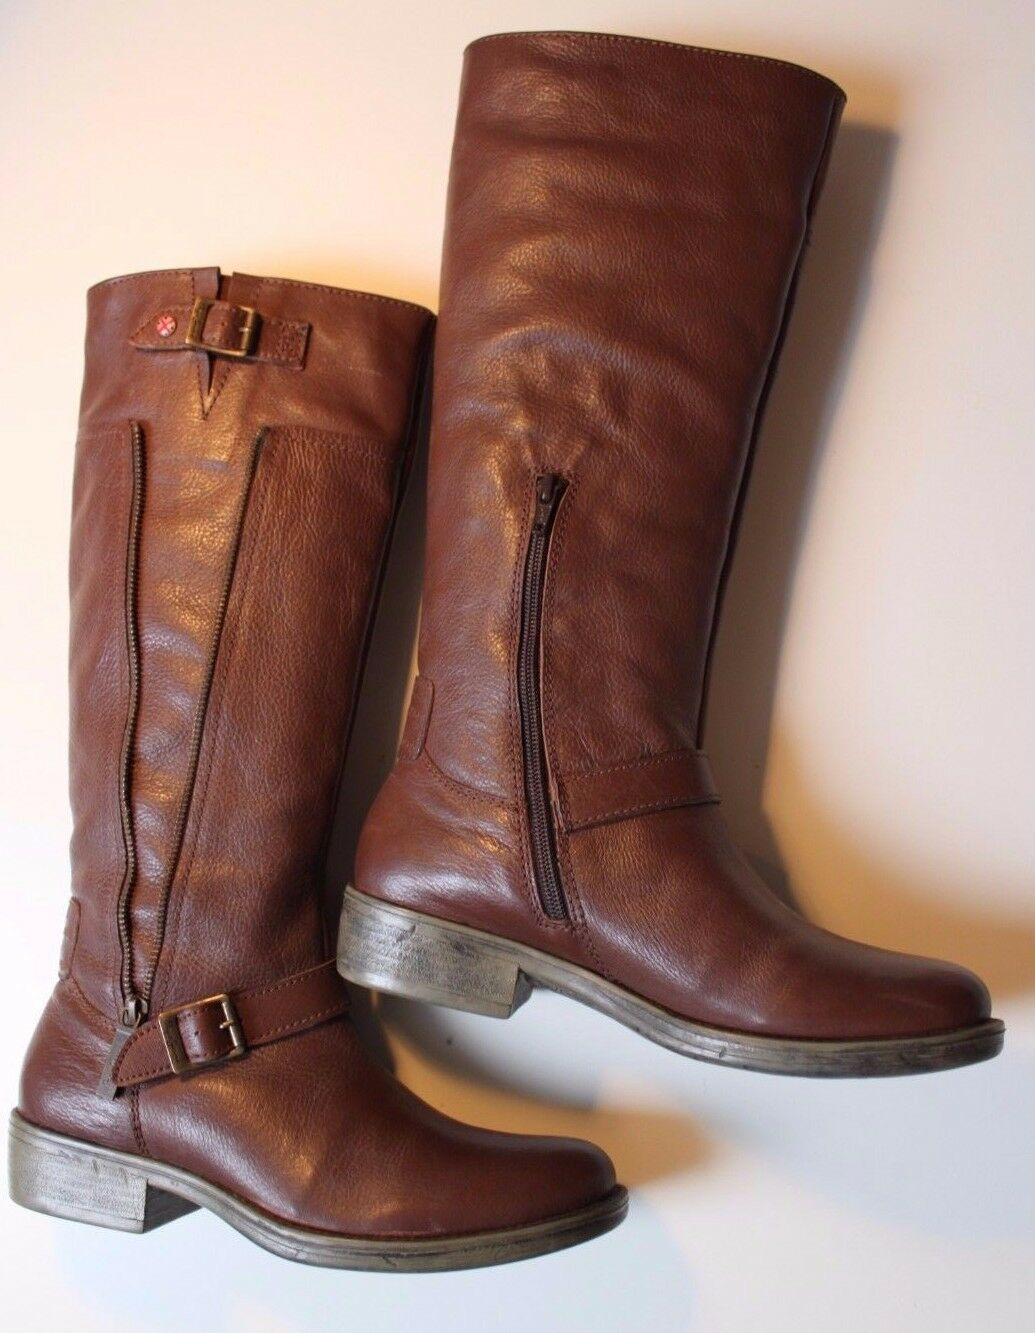 Pepe Jeans Dietrich Moto Stiefel Gr. Schuhe -Tobacco Gr. Stiefel 39 - w.NEU + OVP (NP  ) b25058